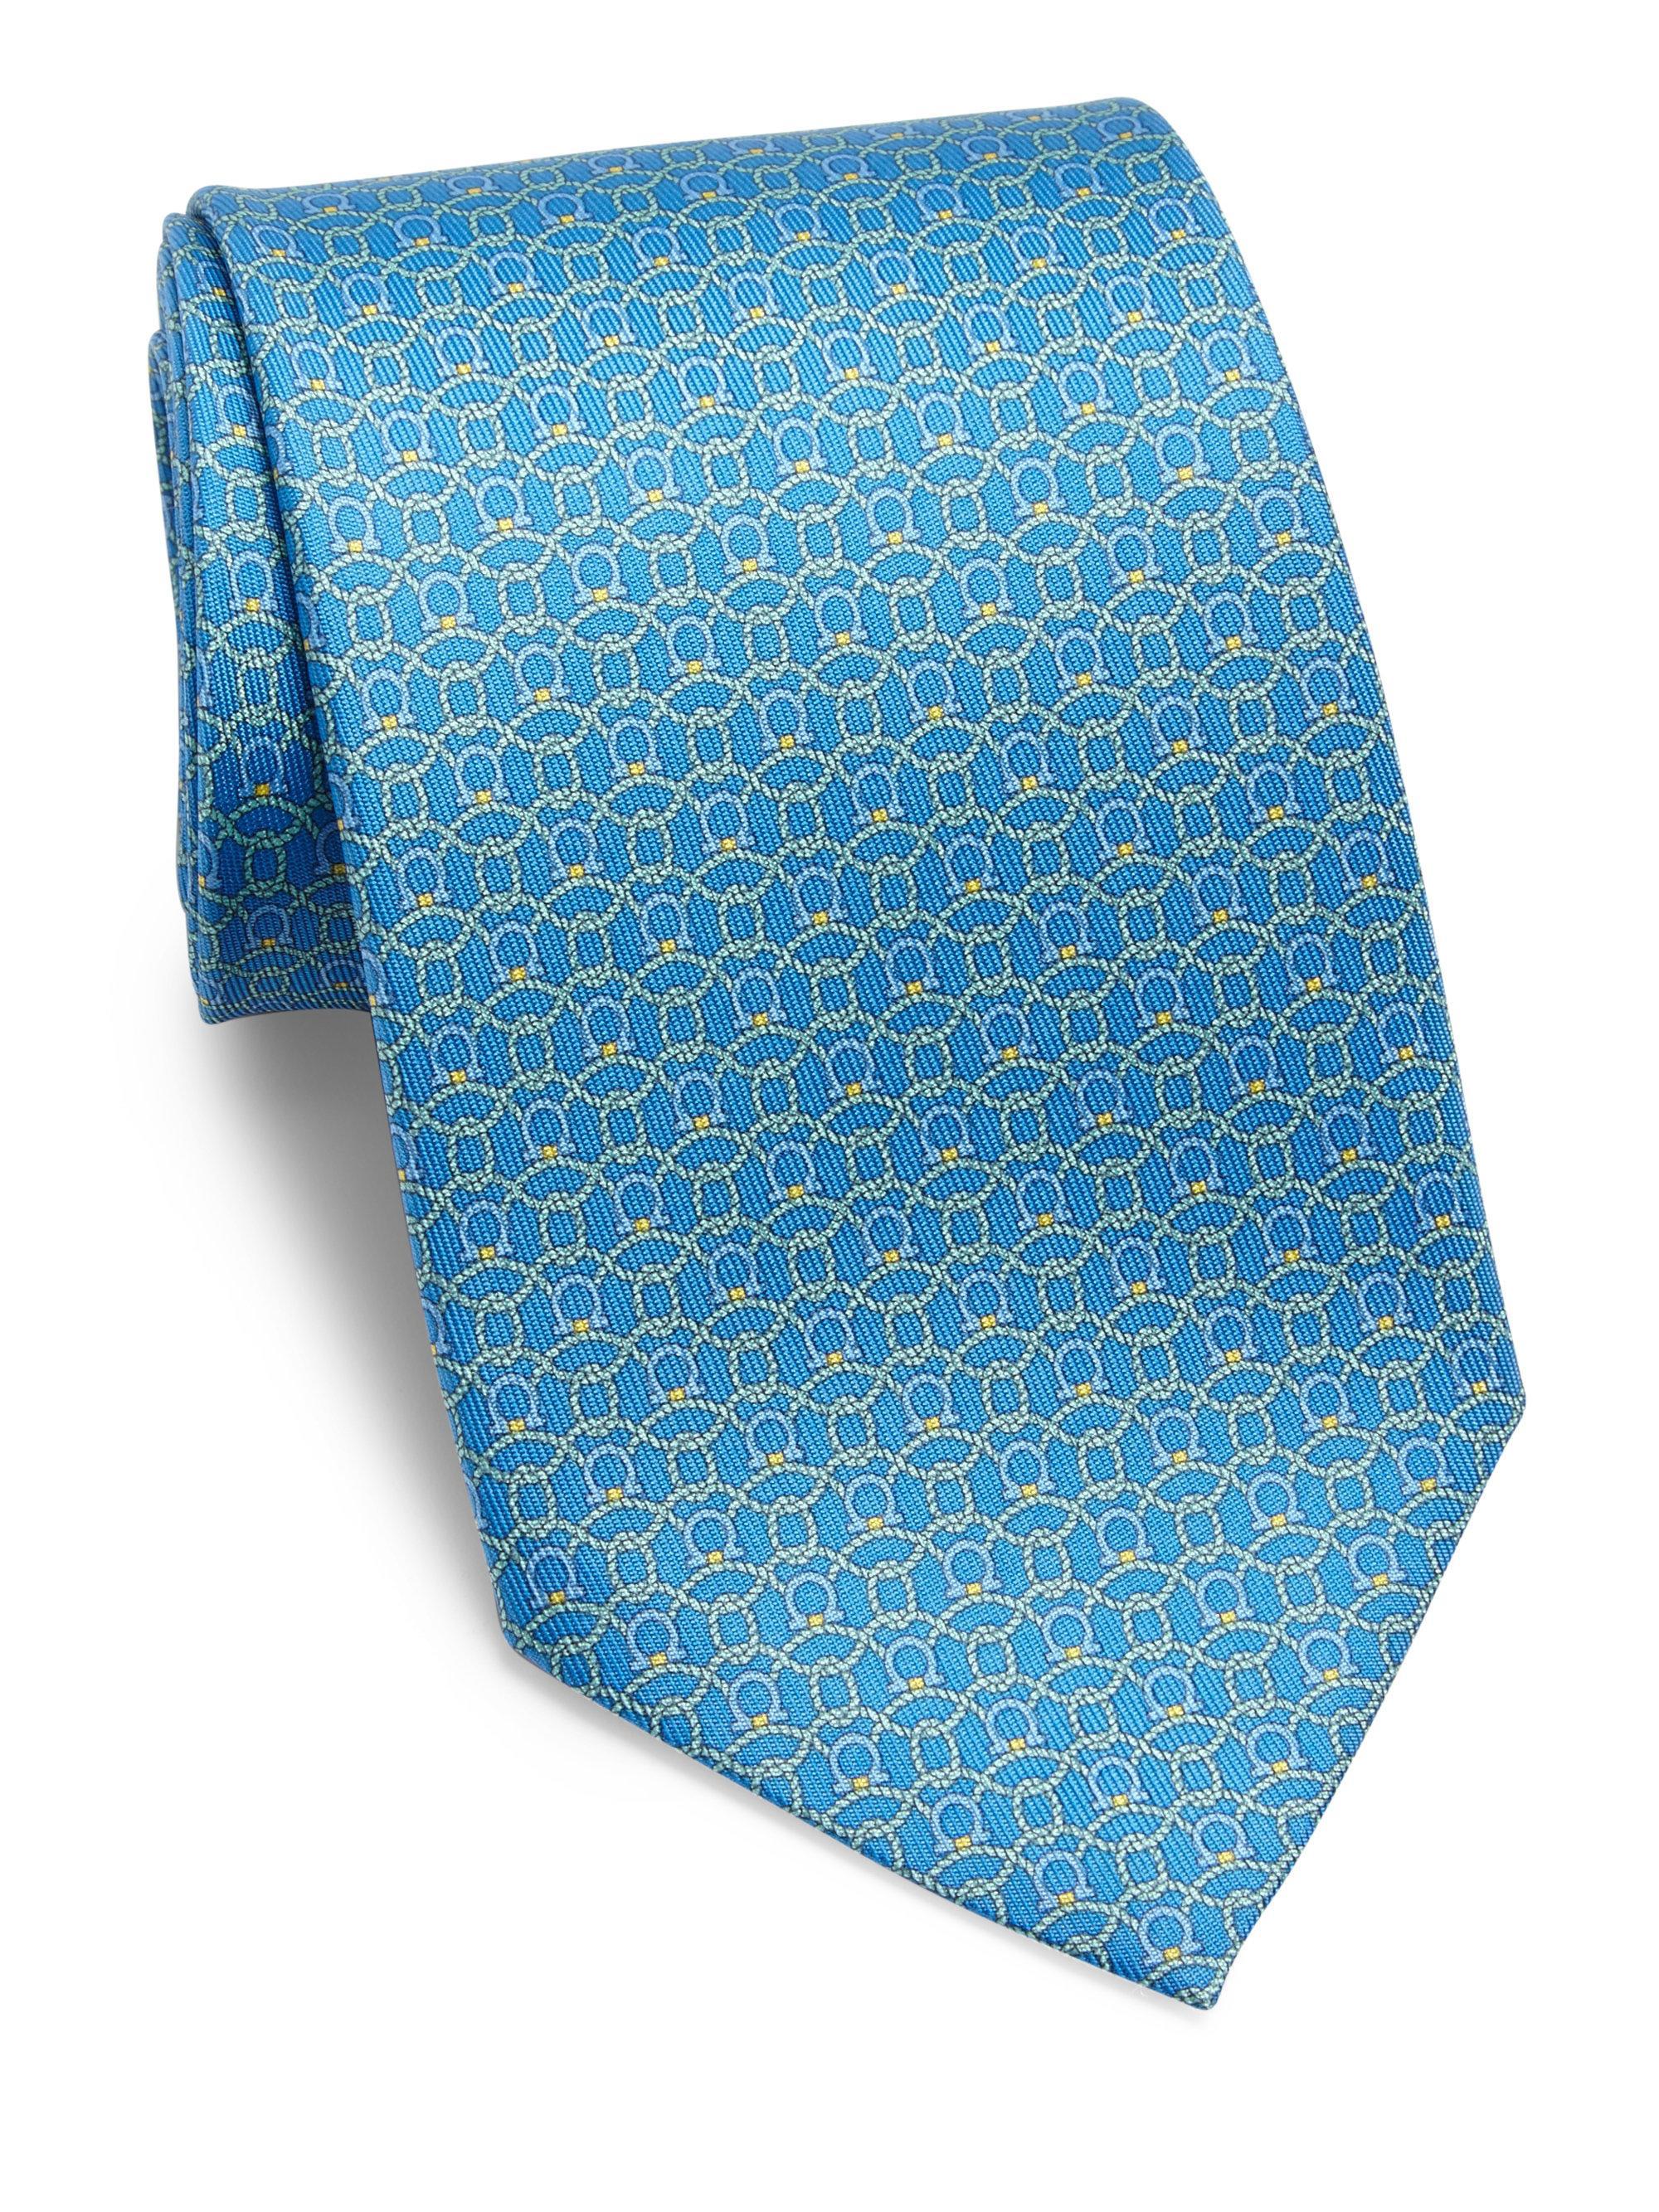 cd7c78743687 Lyst - Ferragamo Rope Gancini Printed Silk Tie in Blue for Men